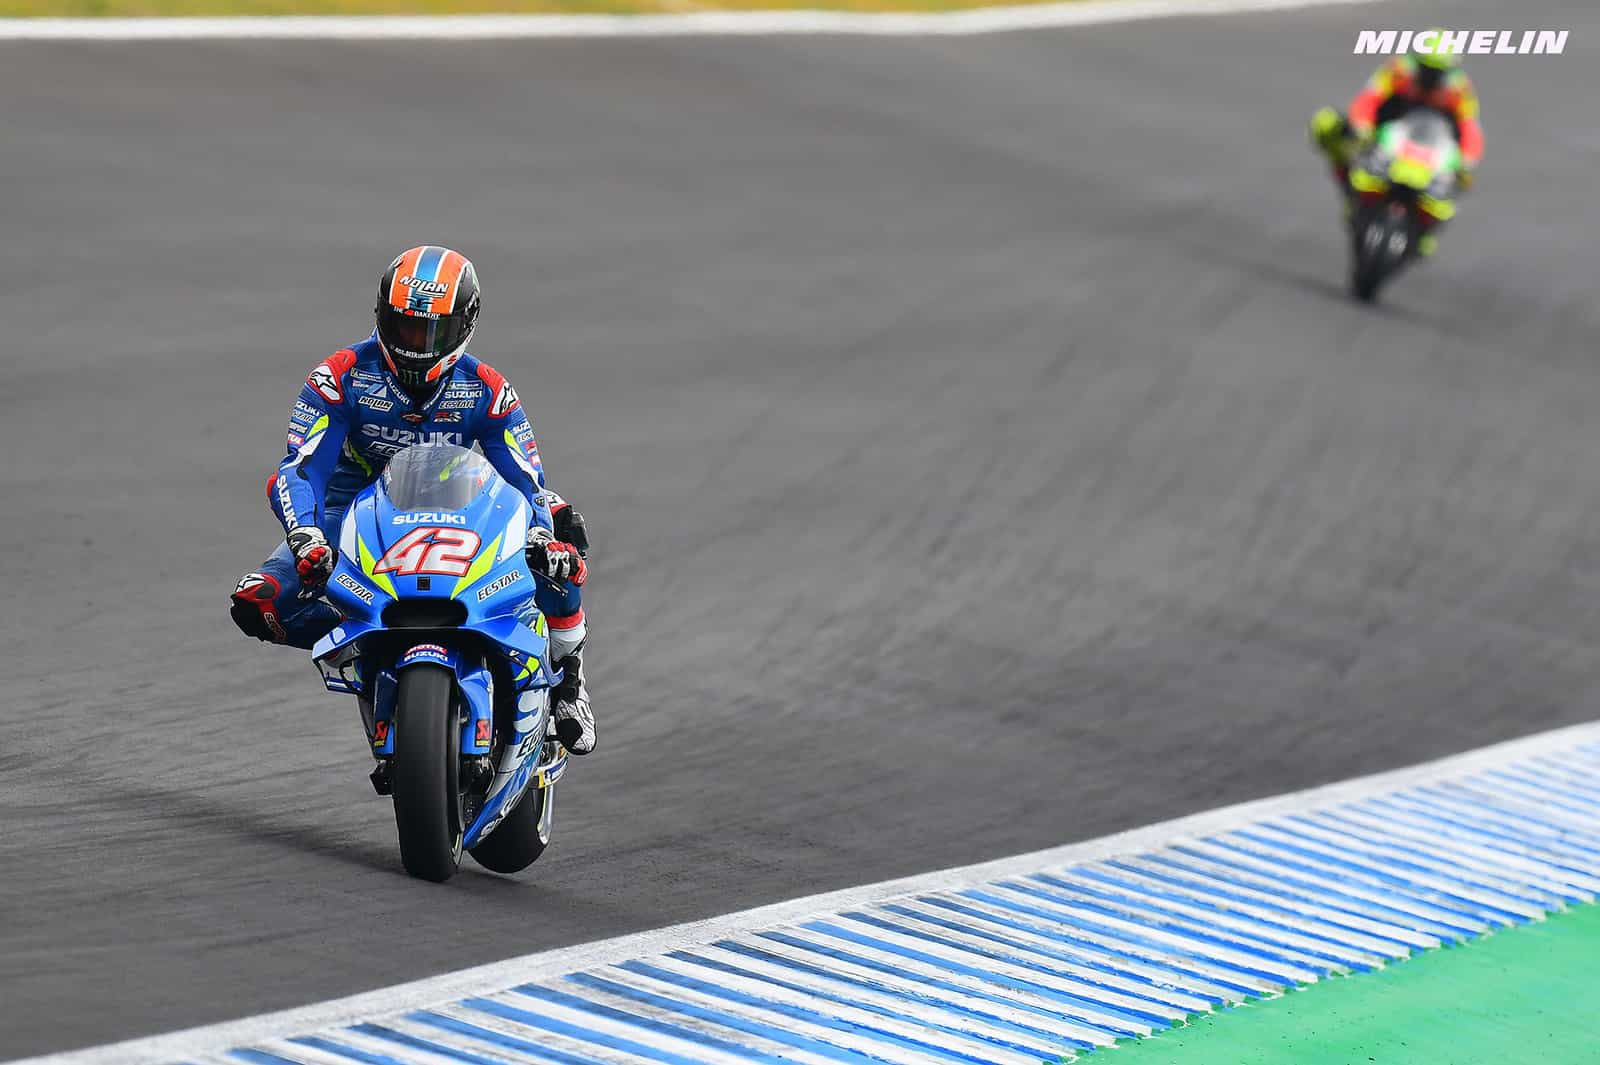 MotoGP2019ヘレスGP 予選9位リンス「フロントタイヤのフィーリングが良くなかった」